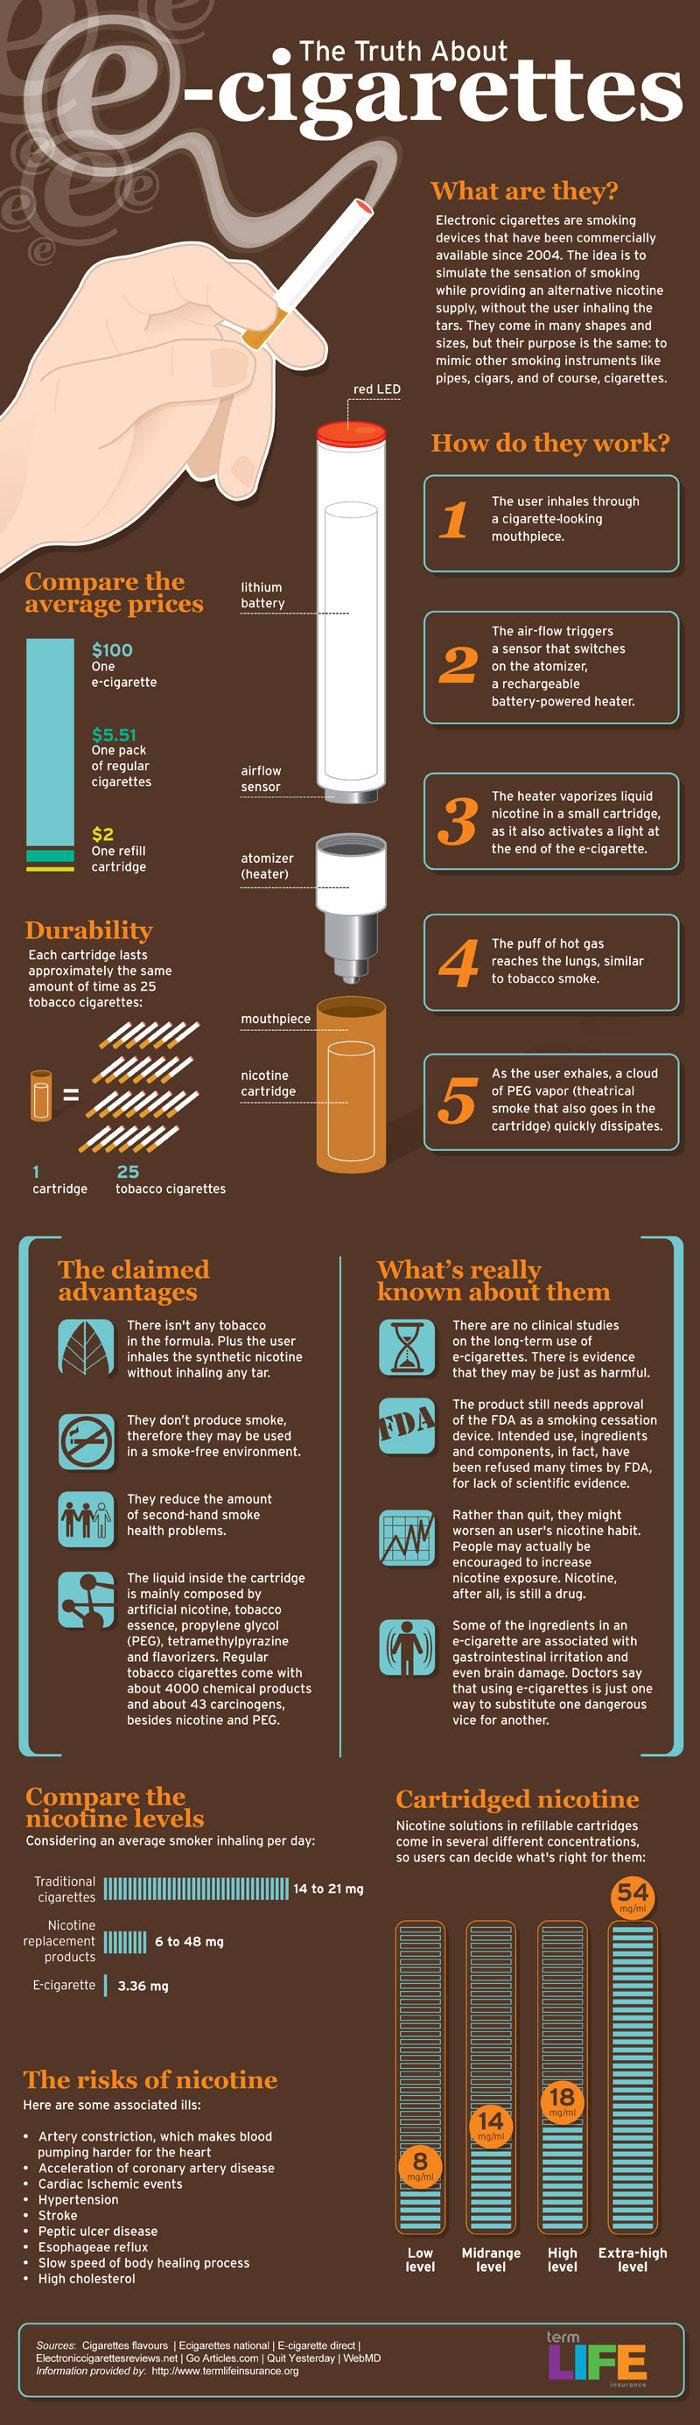 Vapor Cigarette Pros And Cons Hrf